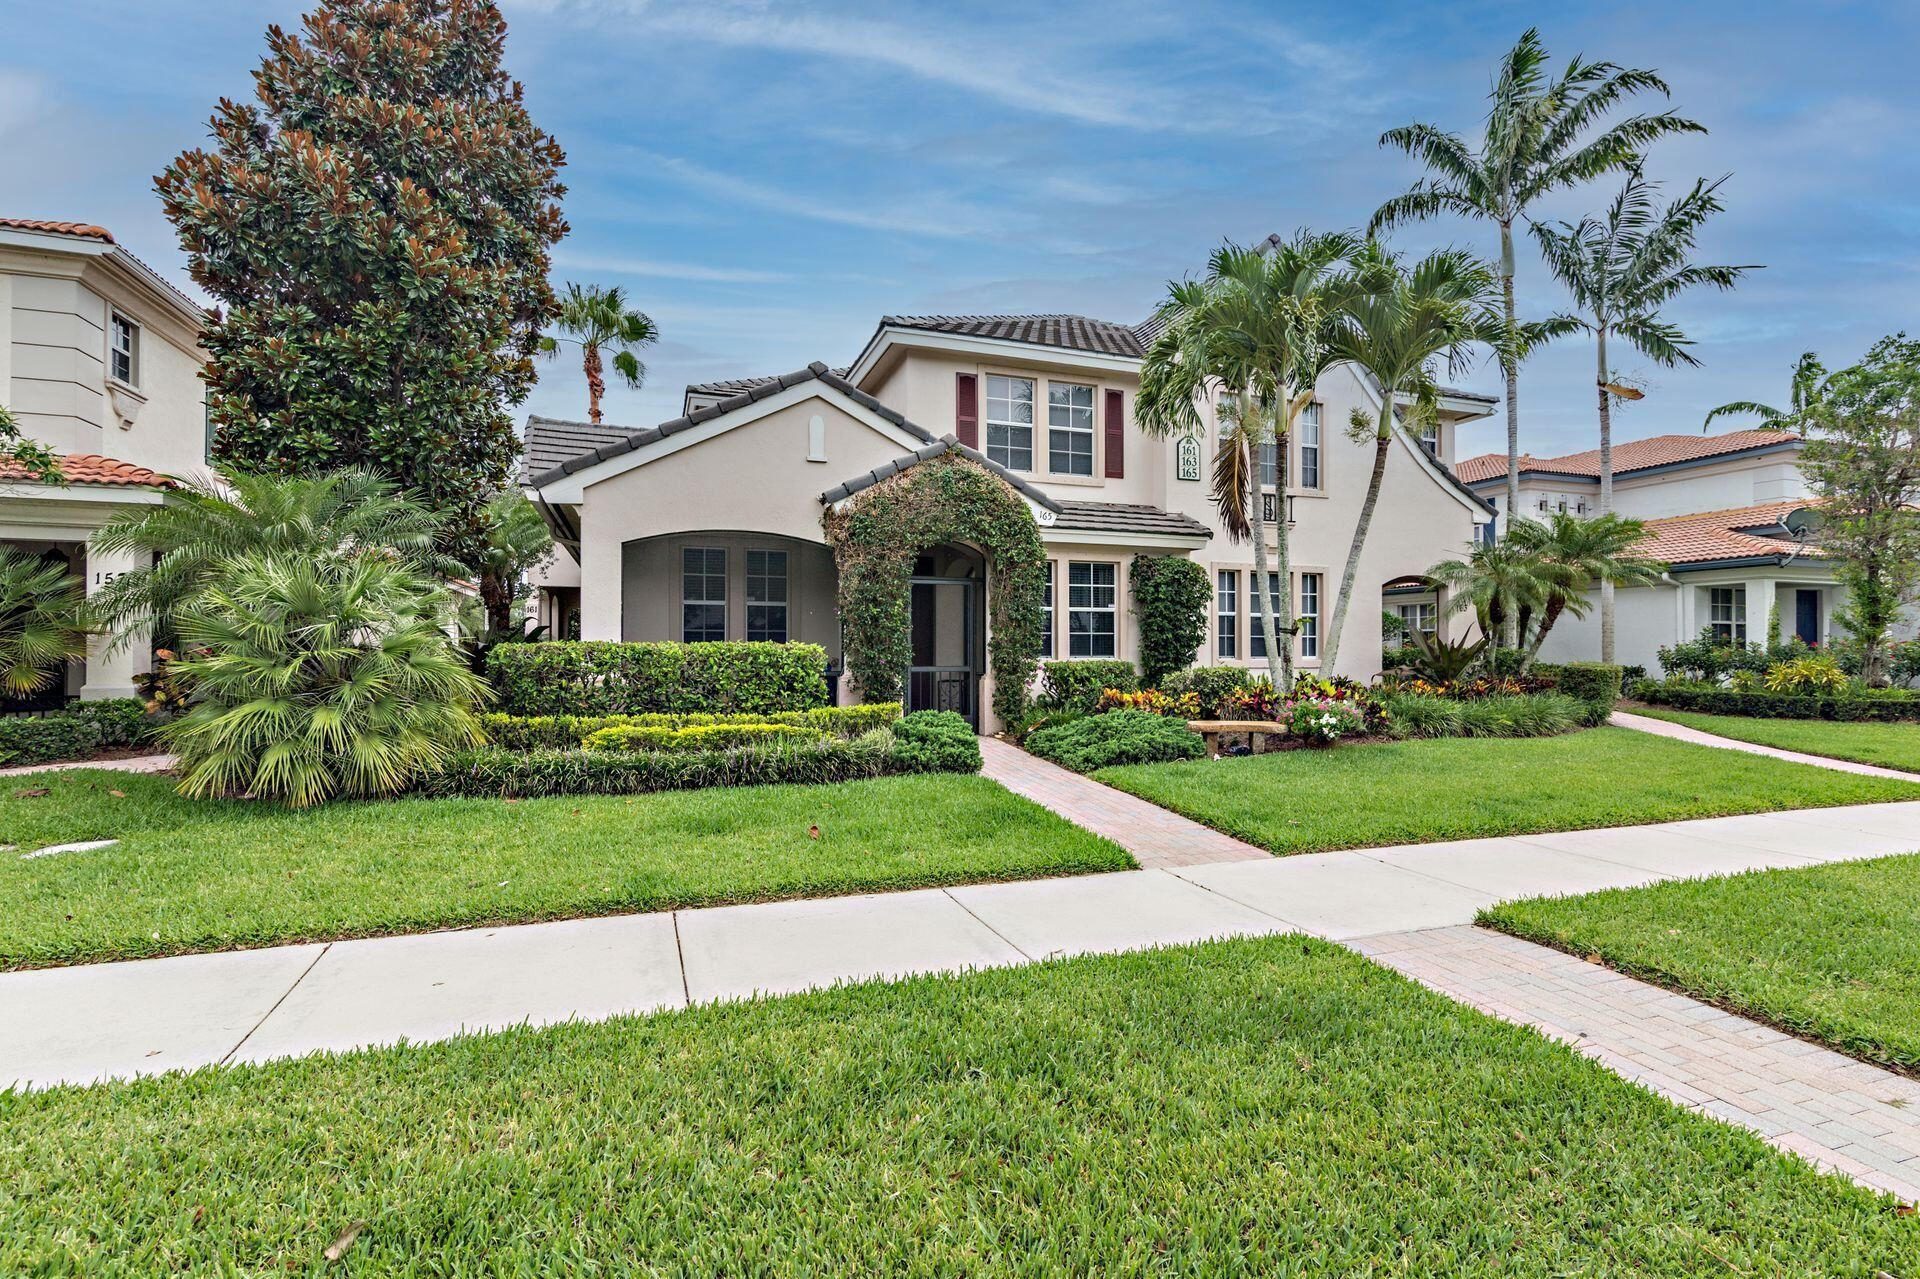 Photo of 161 Evergrene Parkway, Palm Beach Gardens, FL 33410 (MLS # RX-10726977)